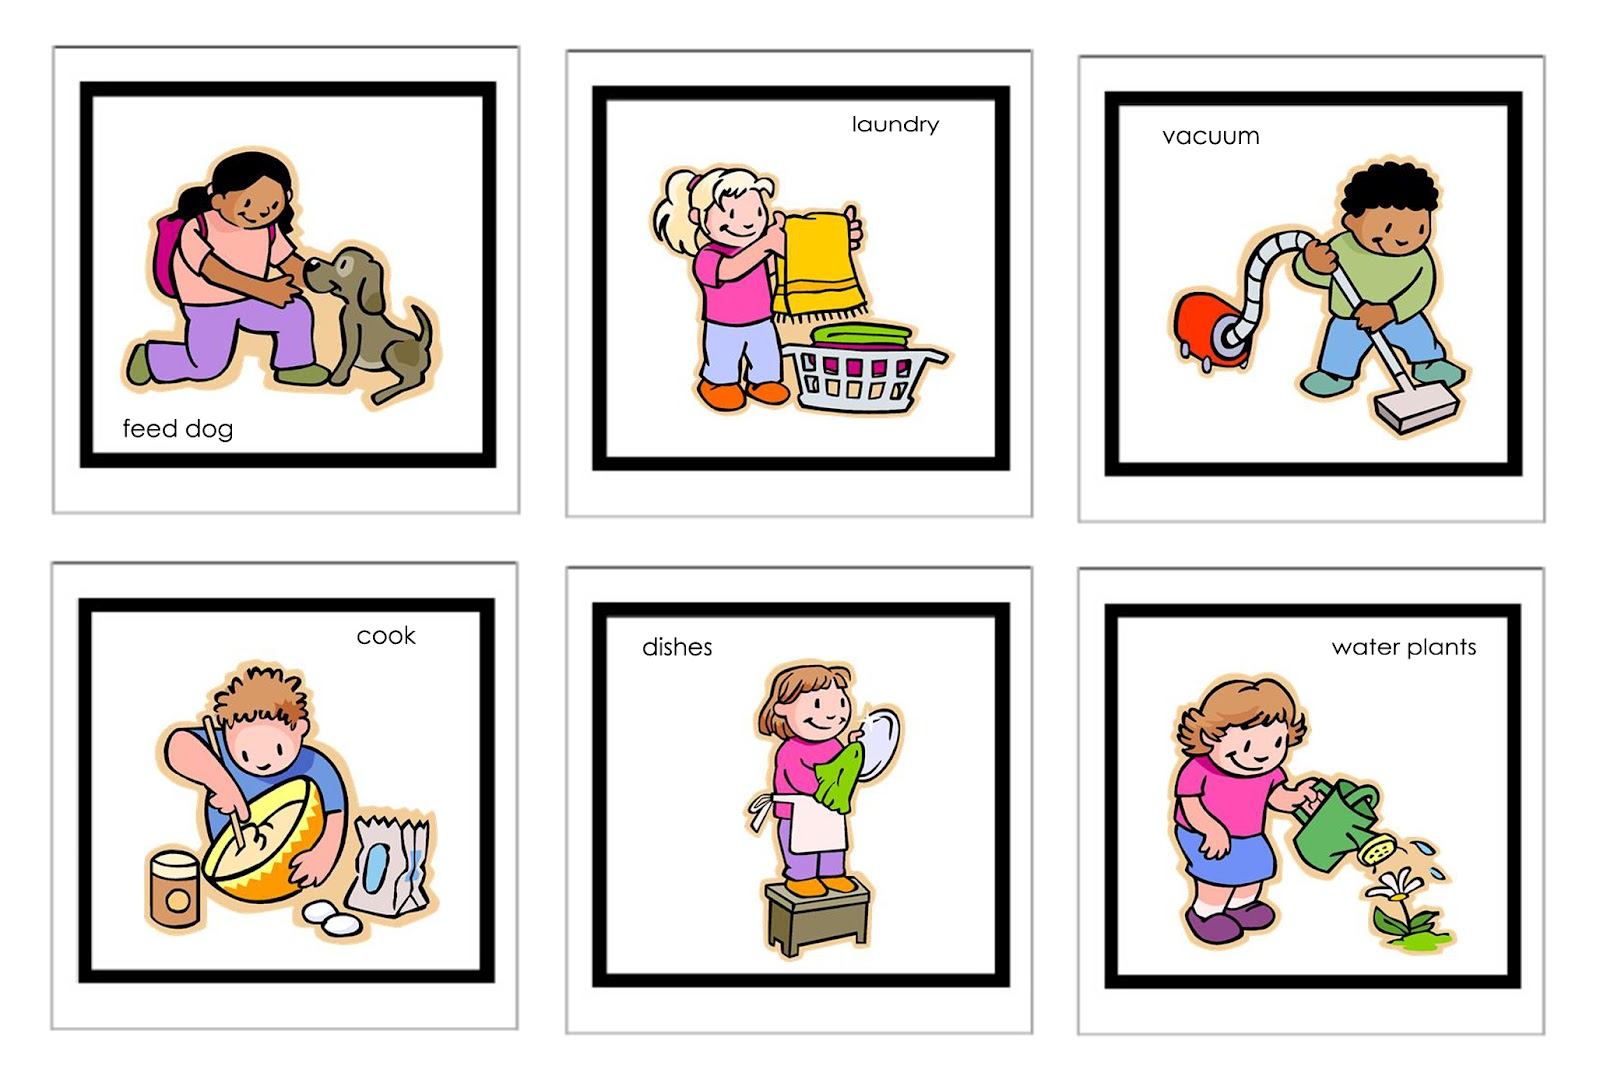 kindergarten schedule clipart - photo #21